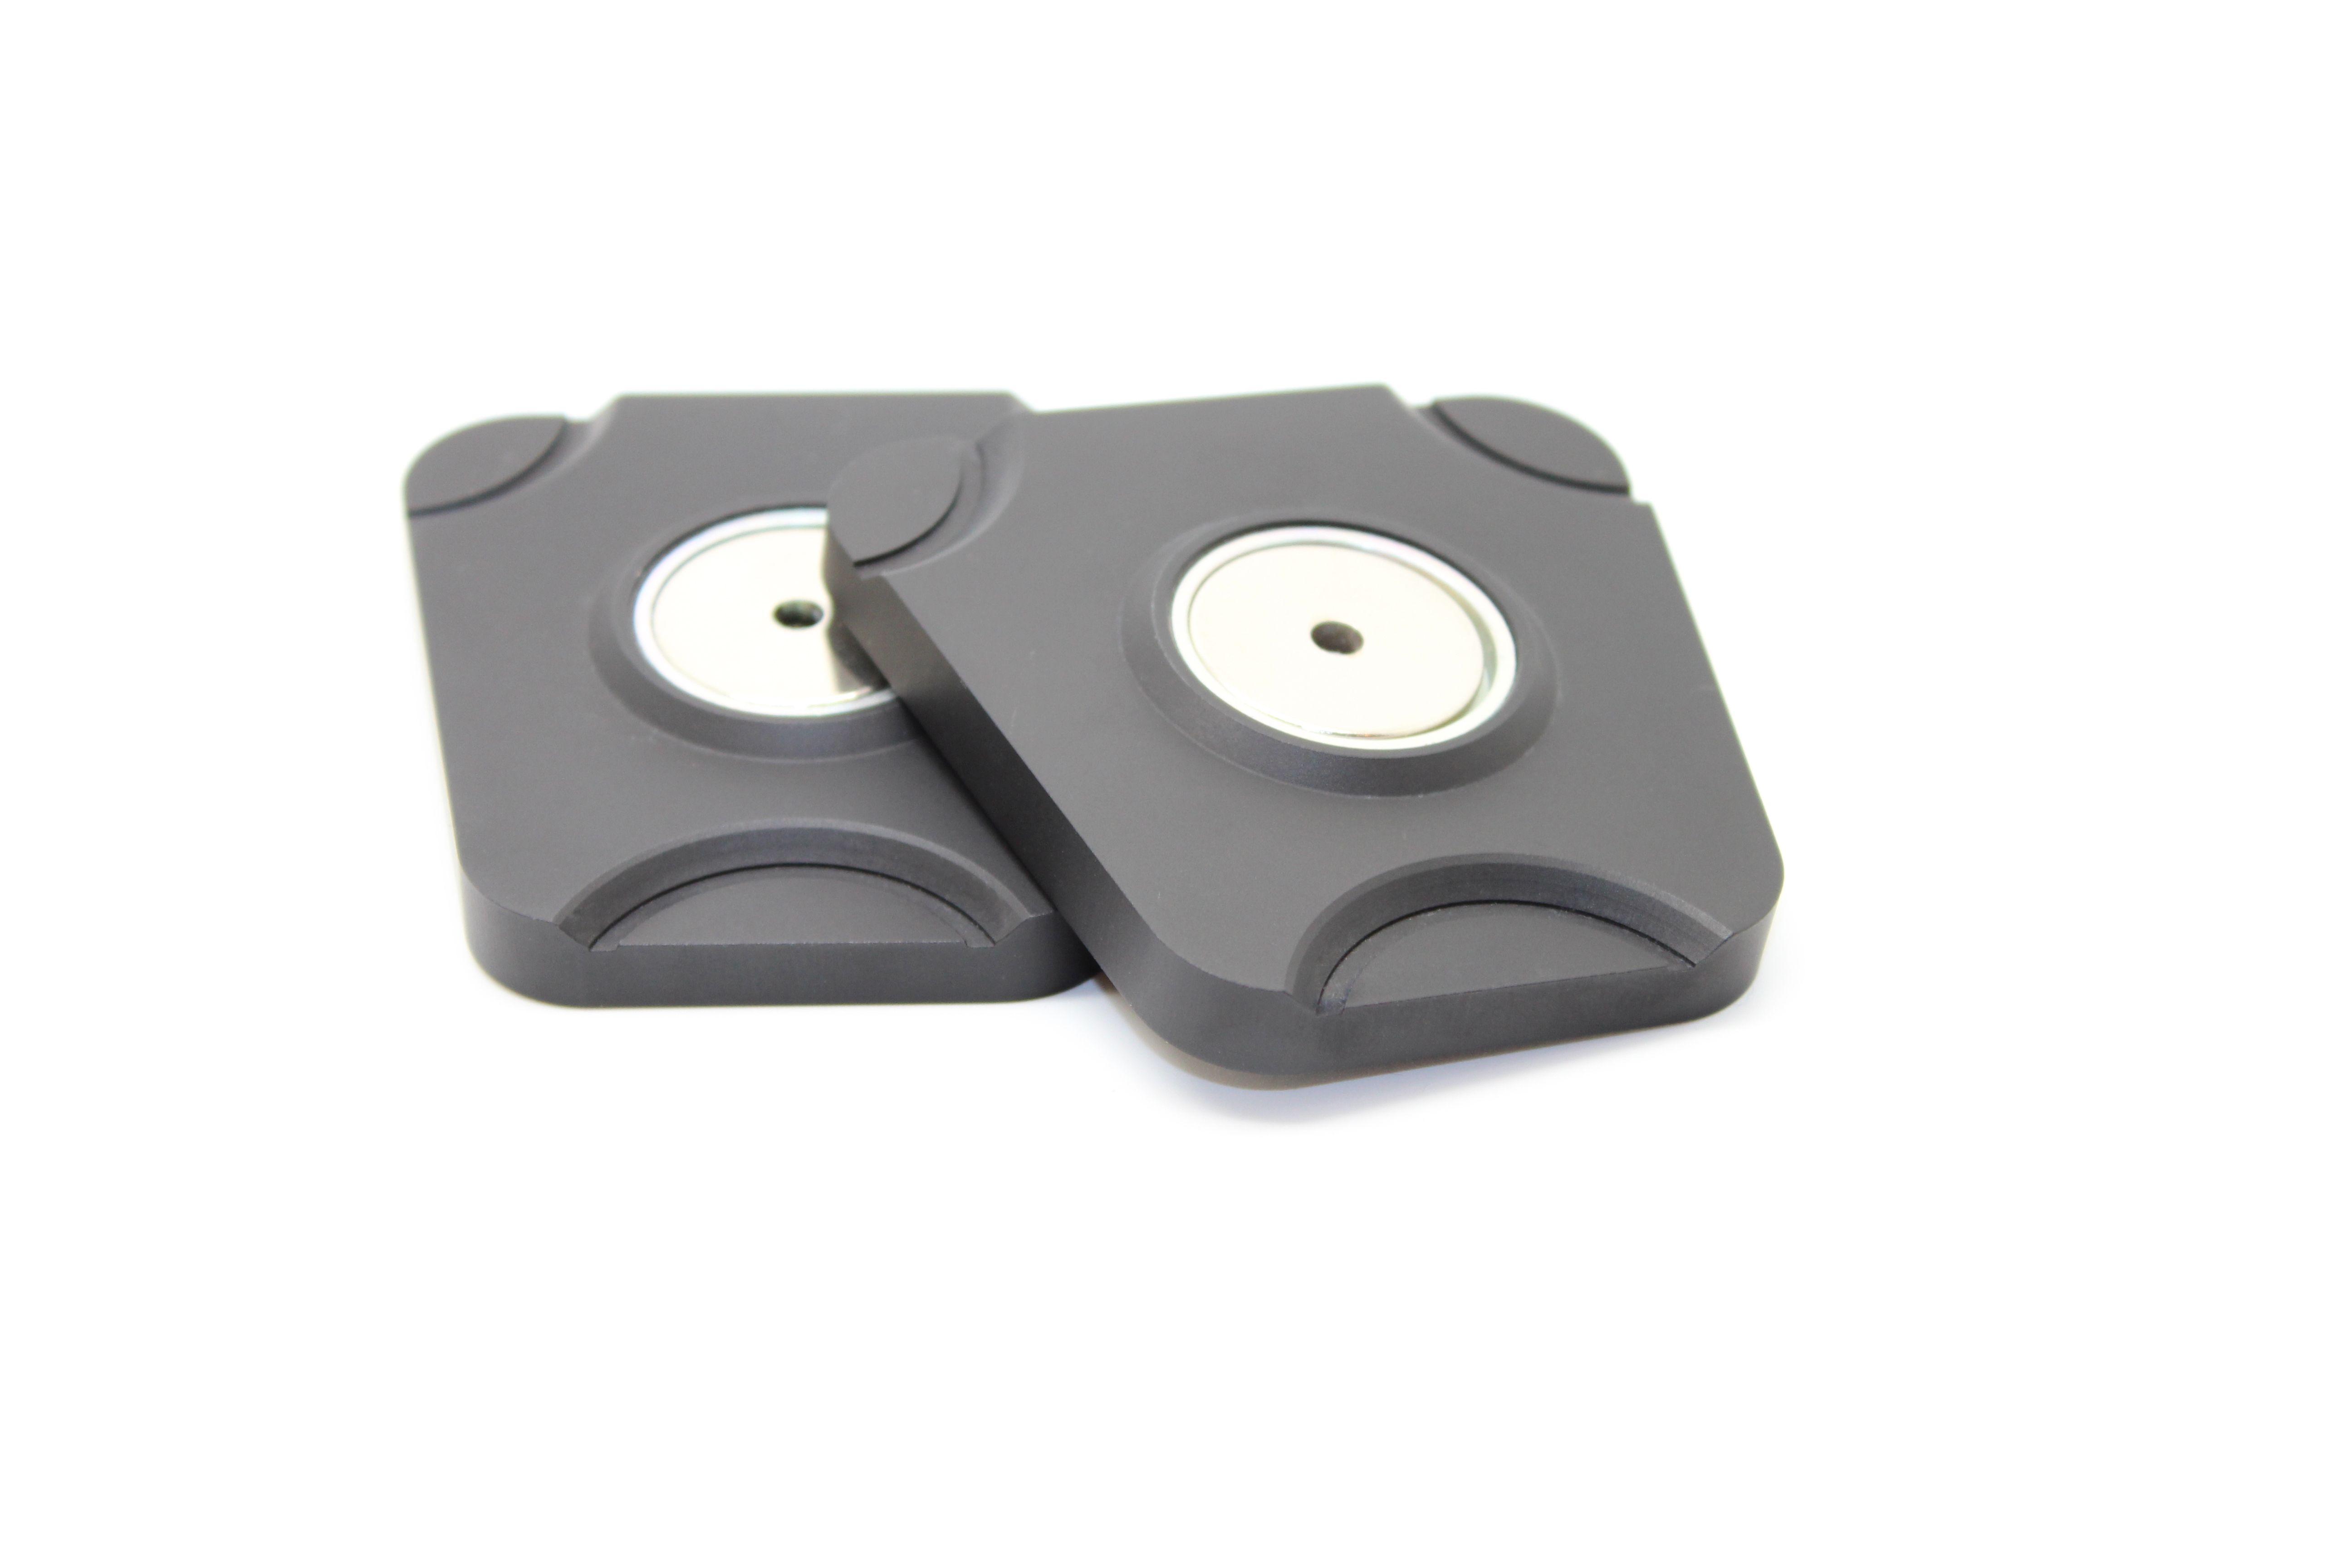 Splitex-Platten für Artex Artikulatoren - neu